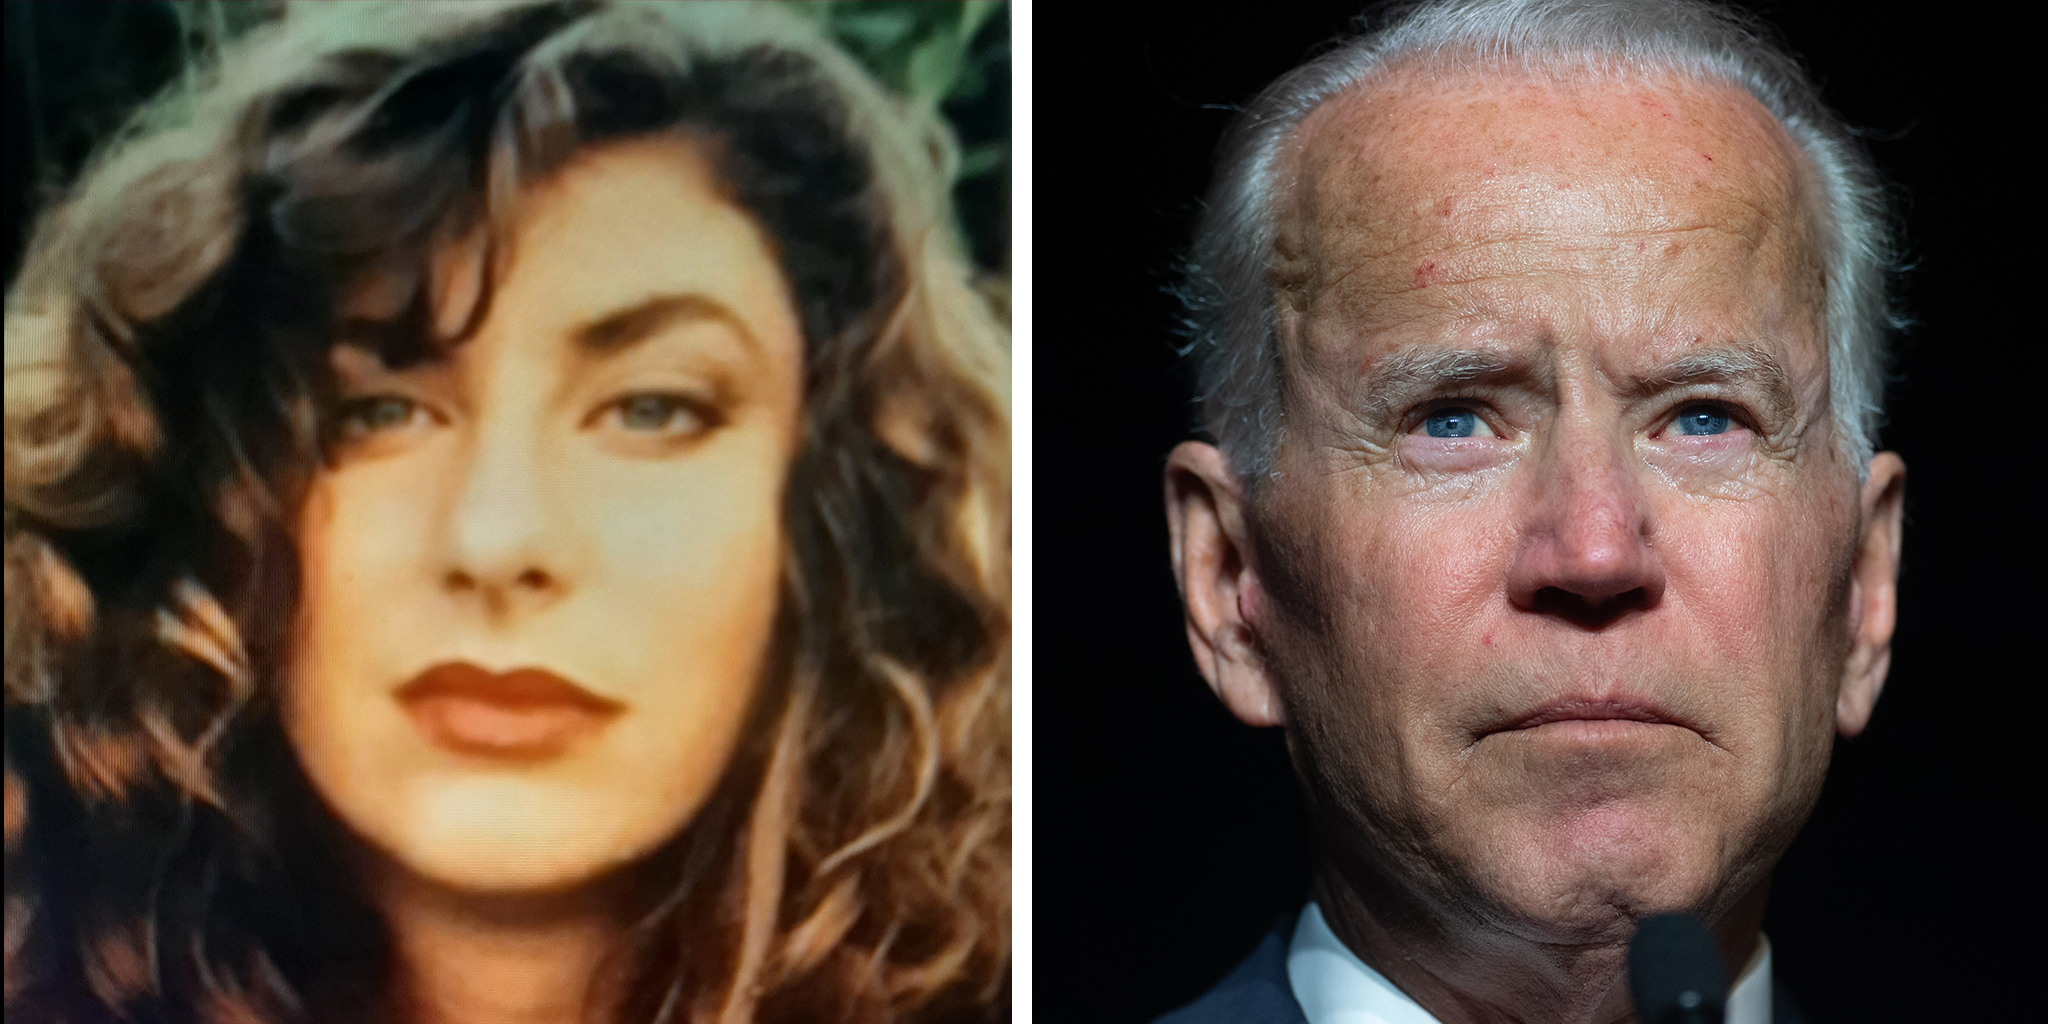 Tara Reade and former US Vice President Joe Biden